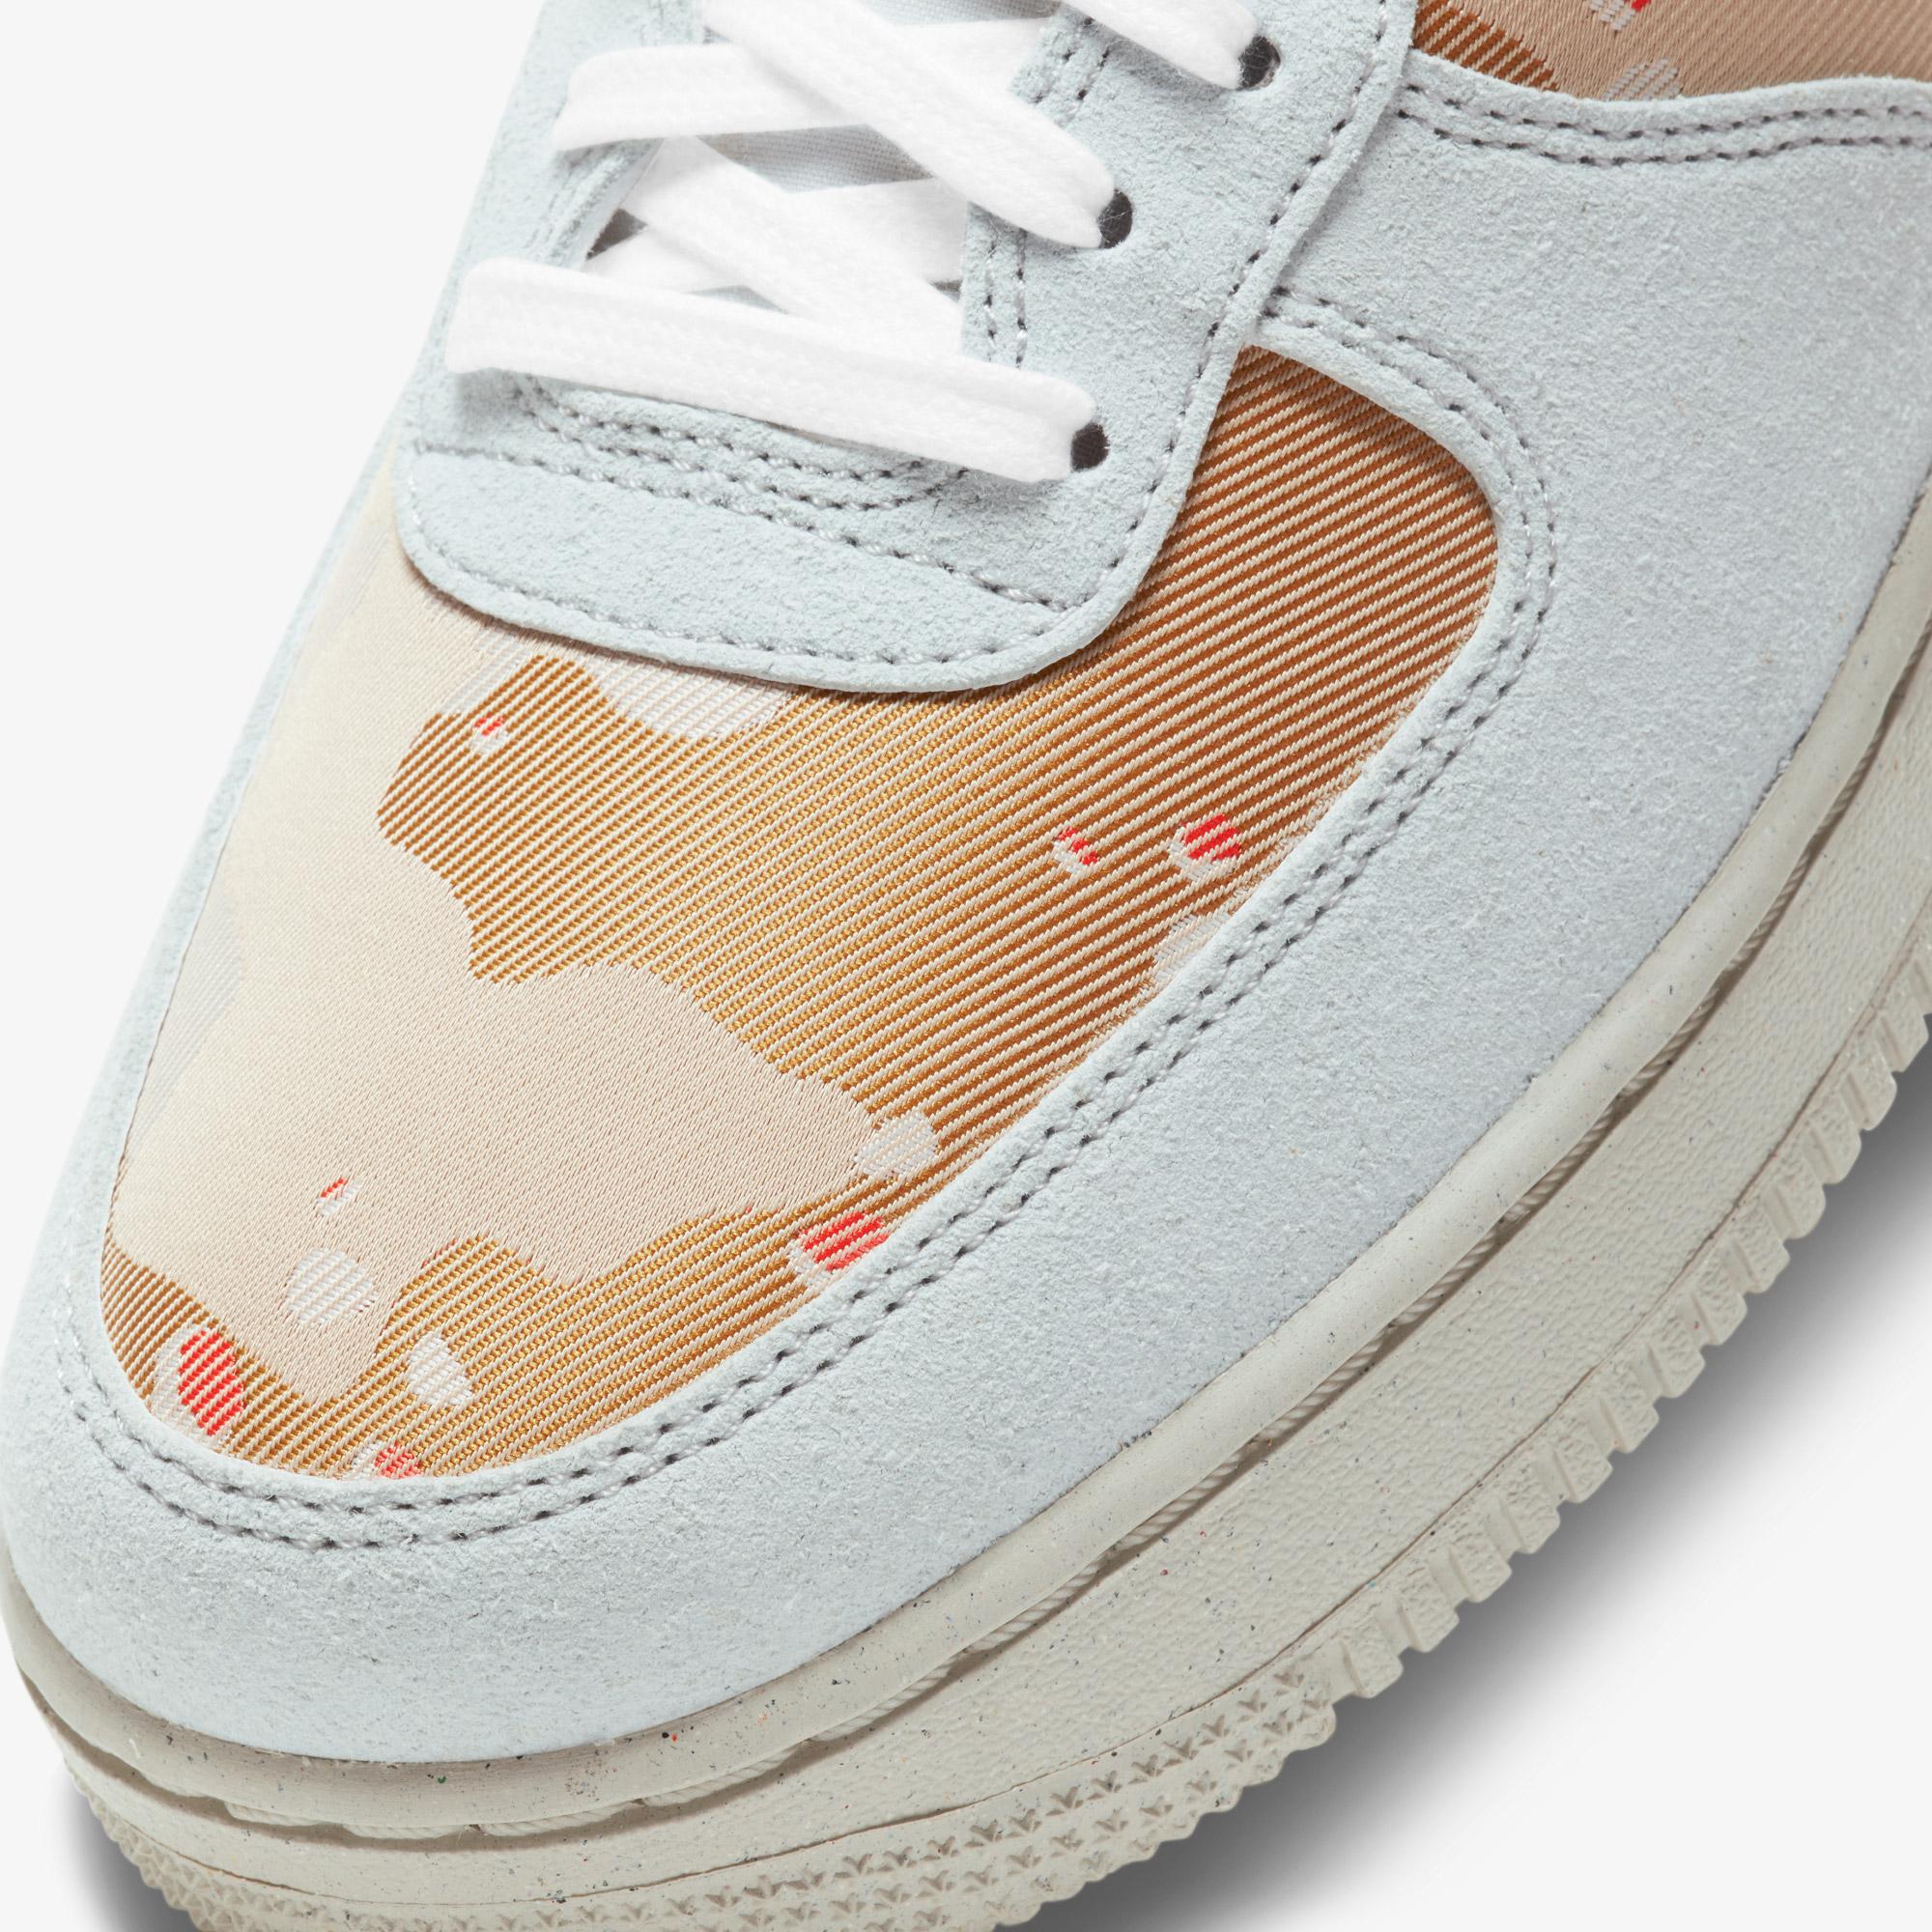 Nike Air Force 1 '07 LX Erkek Siyah Spor Ayakkabı